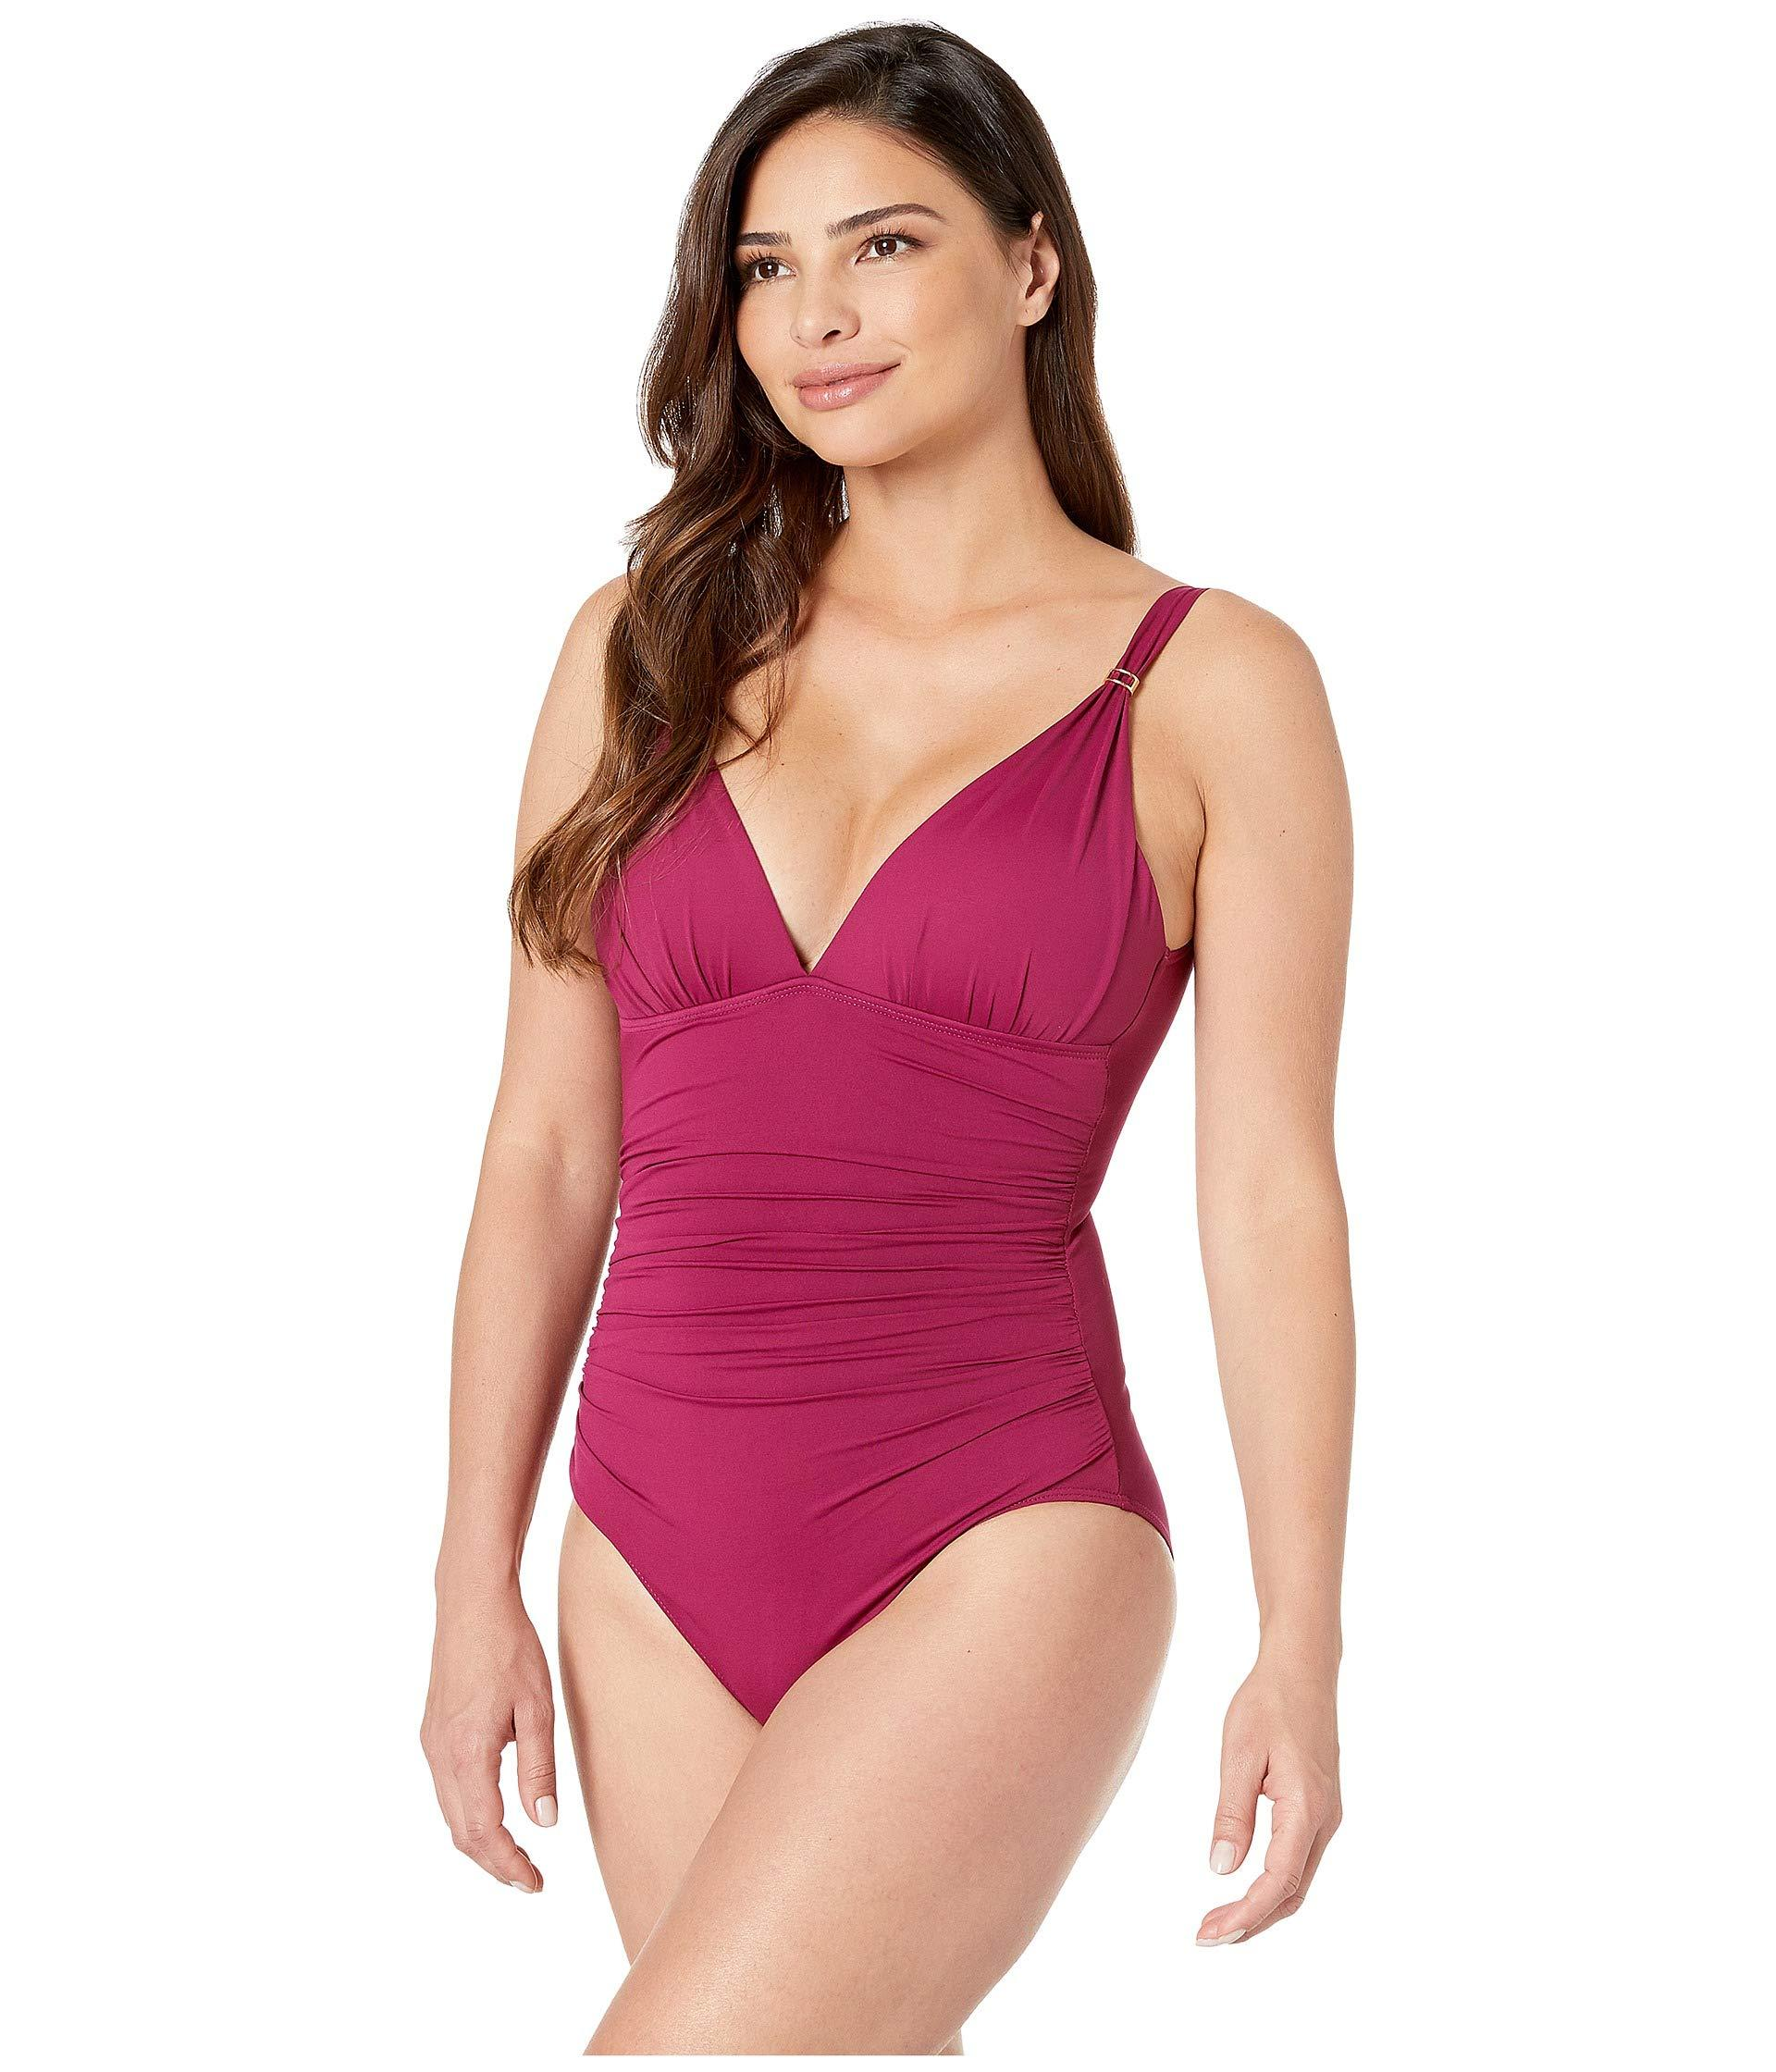 79d624e906 Lyst - Lauren by Ralph Lauren Beach Club Solids Slimming Fit Over The  Shoulder One-piece (plum) Women's Swimsuits One Piece in Purple